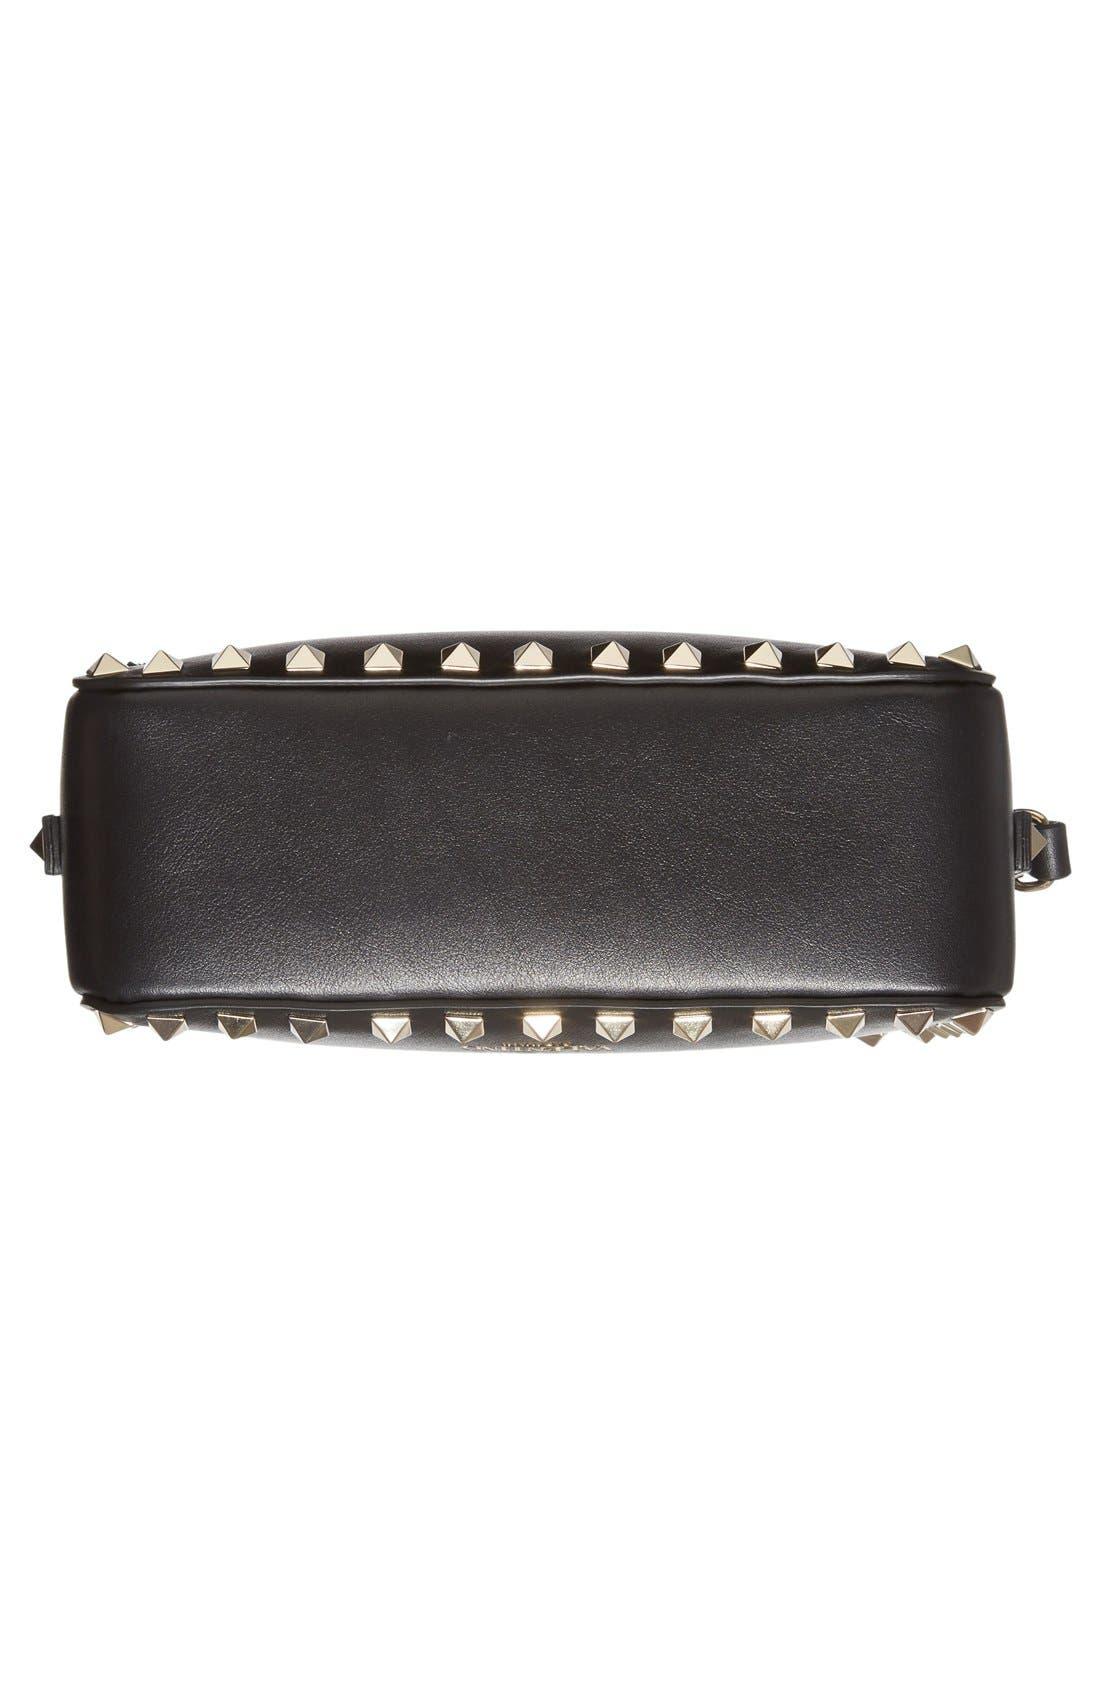 'Rockstud' Calfskin Leather Camera Crossbody Bag,                             Alternate thumbnail 7, color,                             NERO